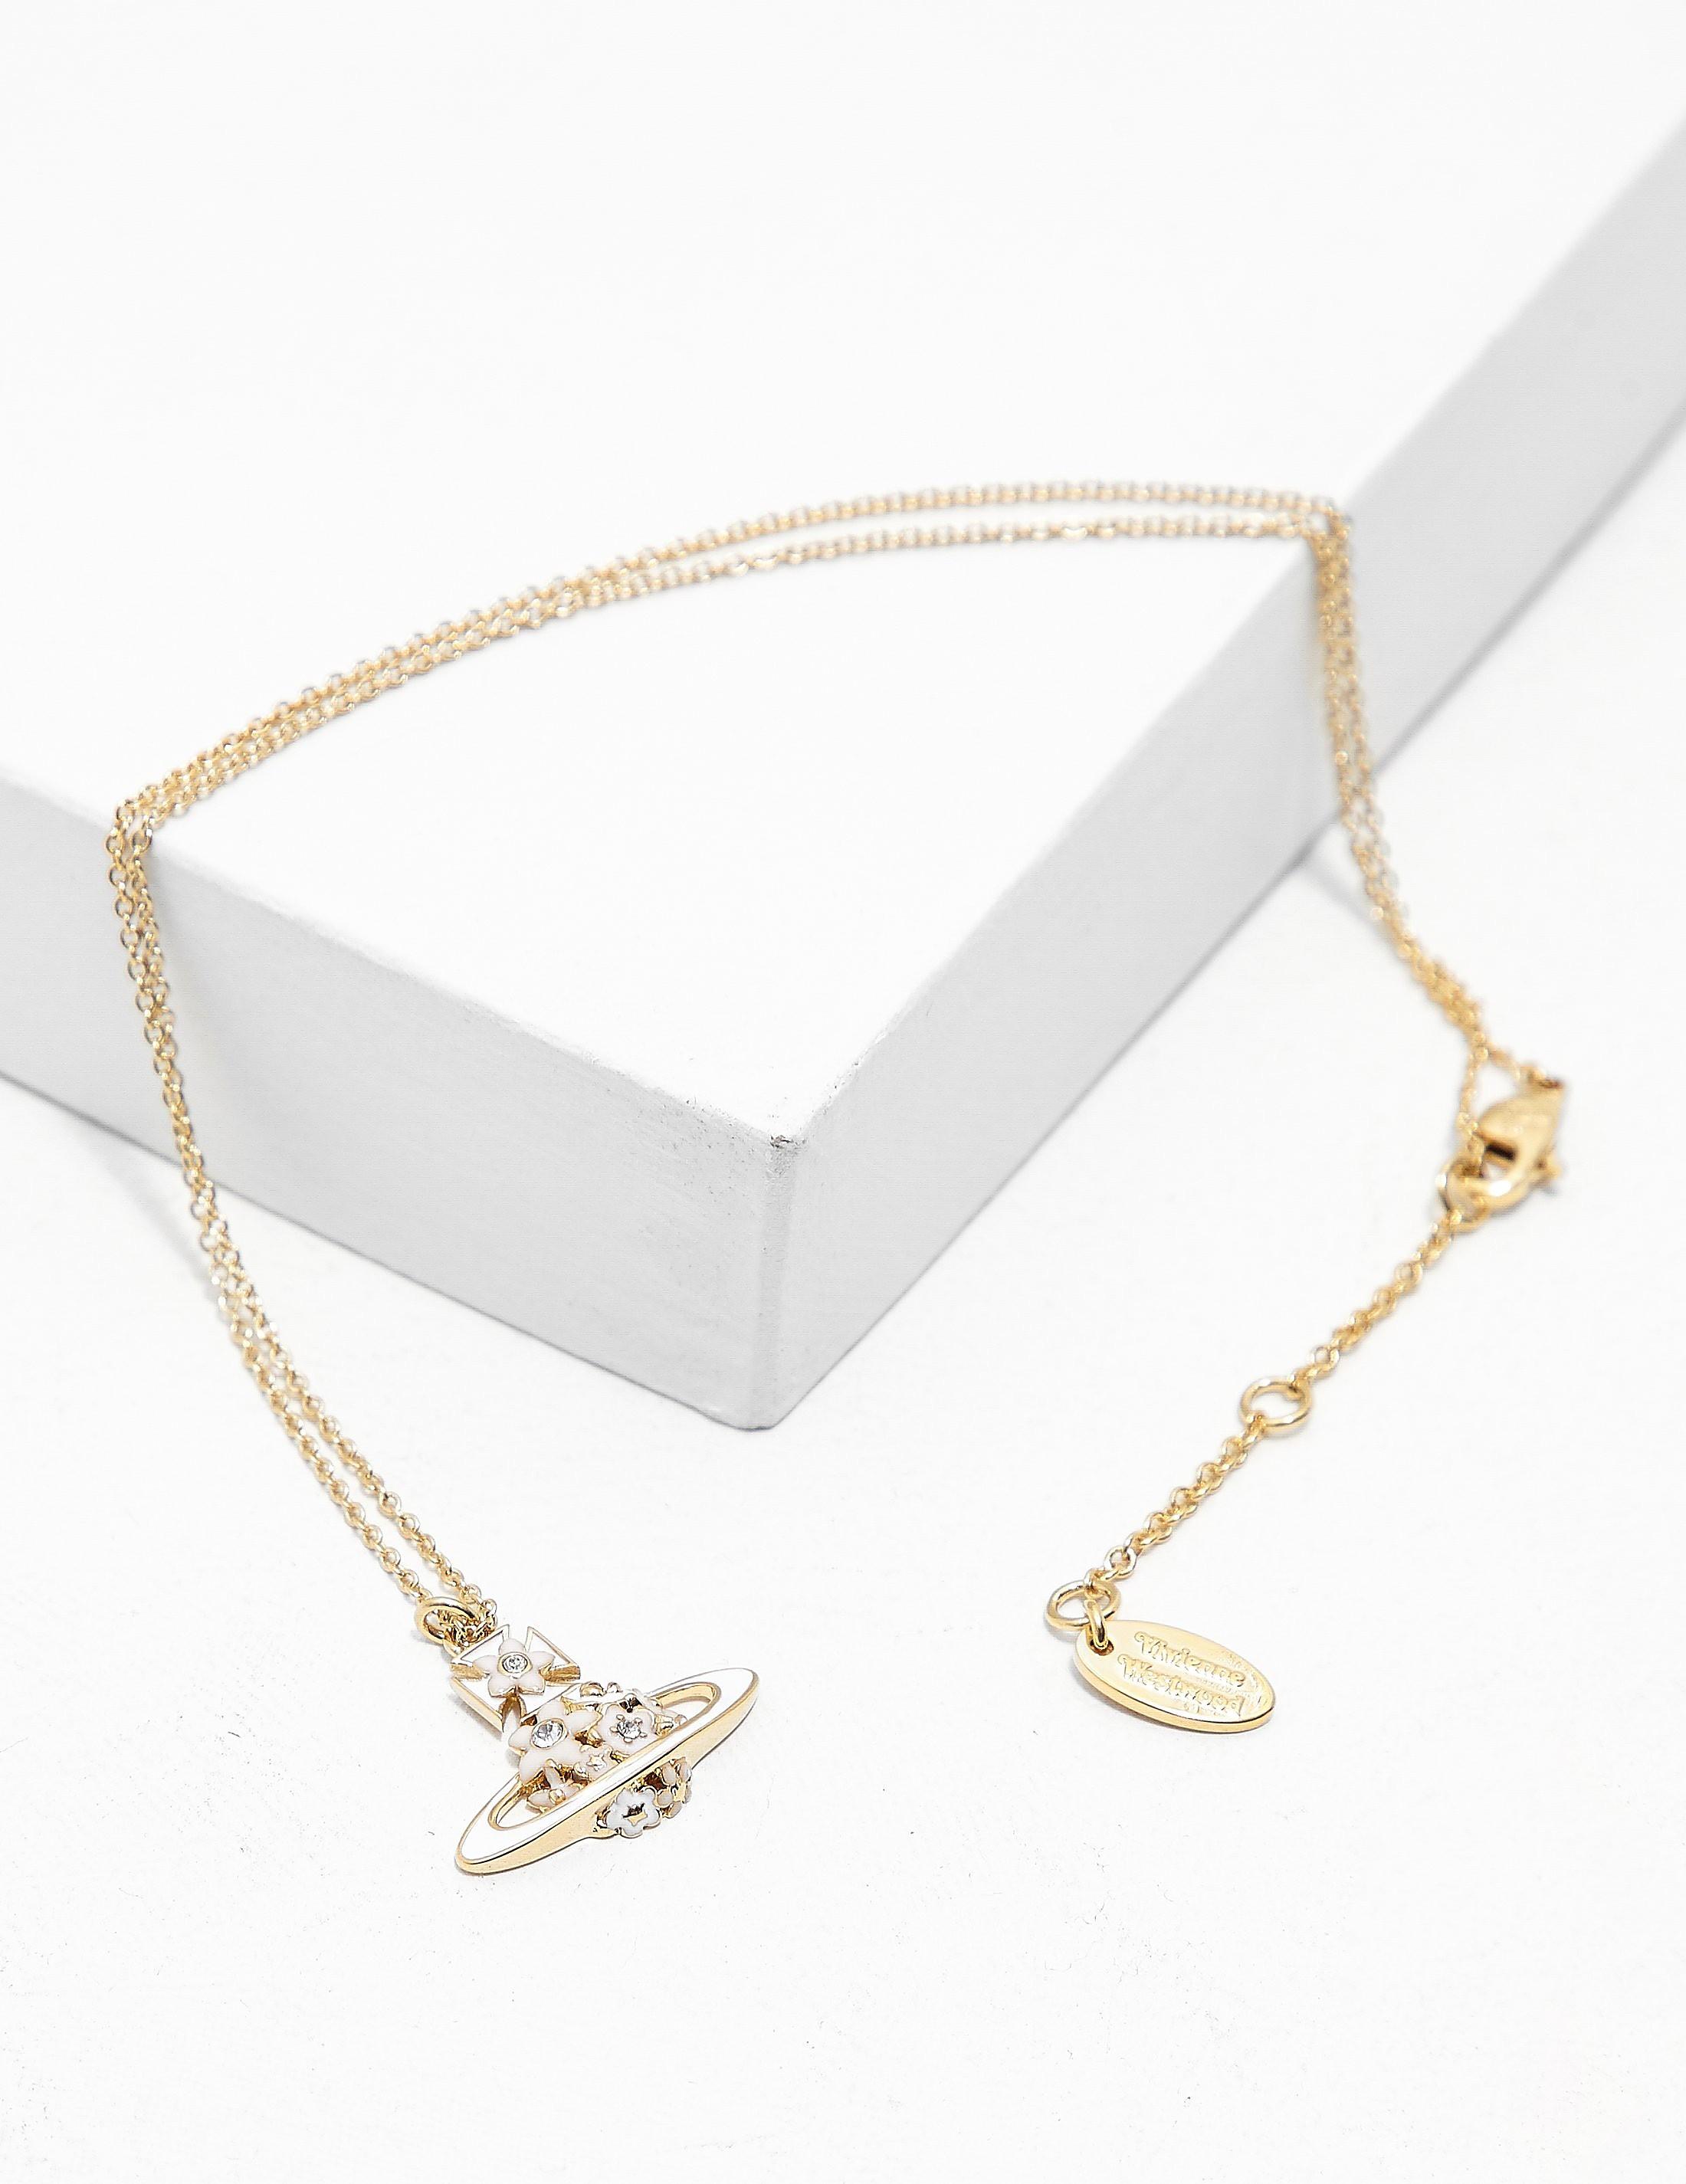 Vivienne Westwood Azalea Necklace